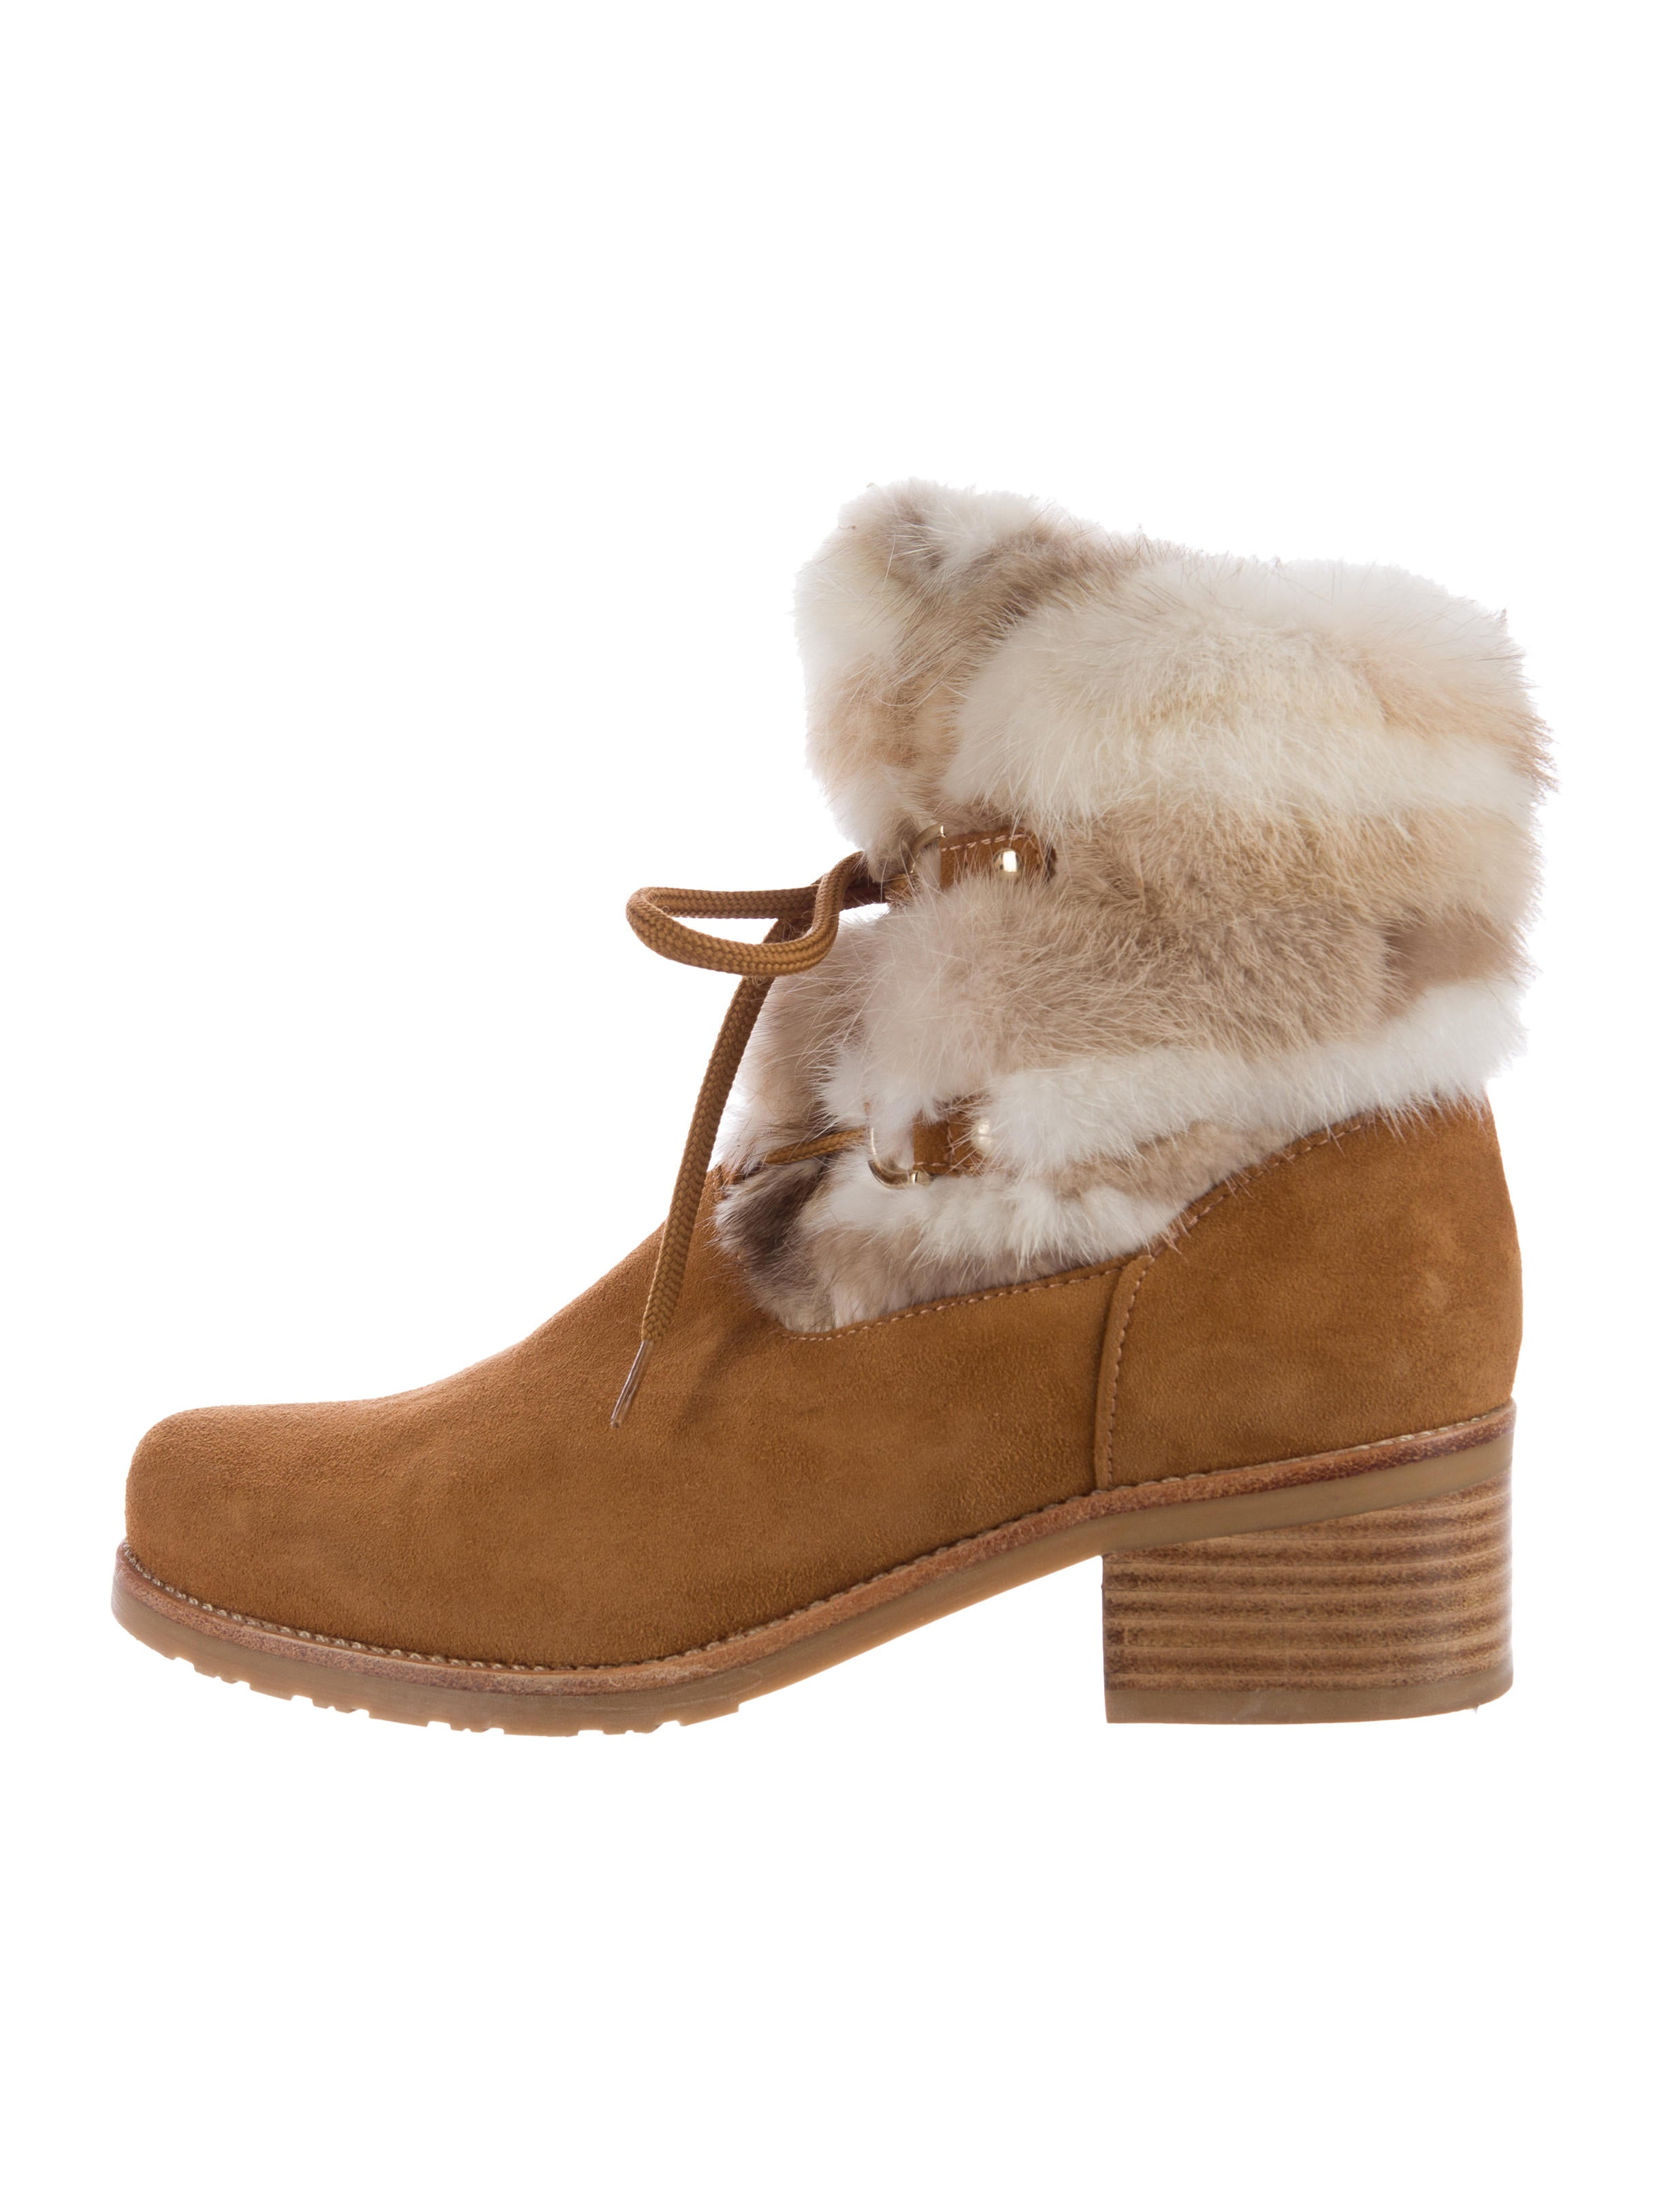 3027d190780 Stuart Weitzman Furnace Mink-Trimmed Ankle Boots - Shoes - WSU28628 ...